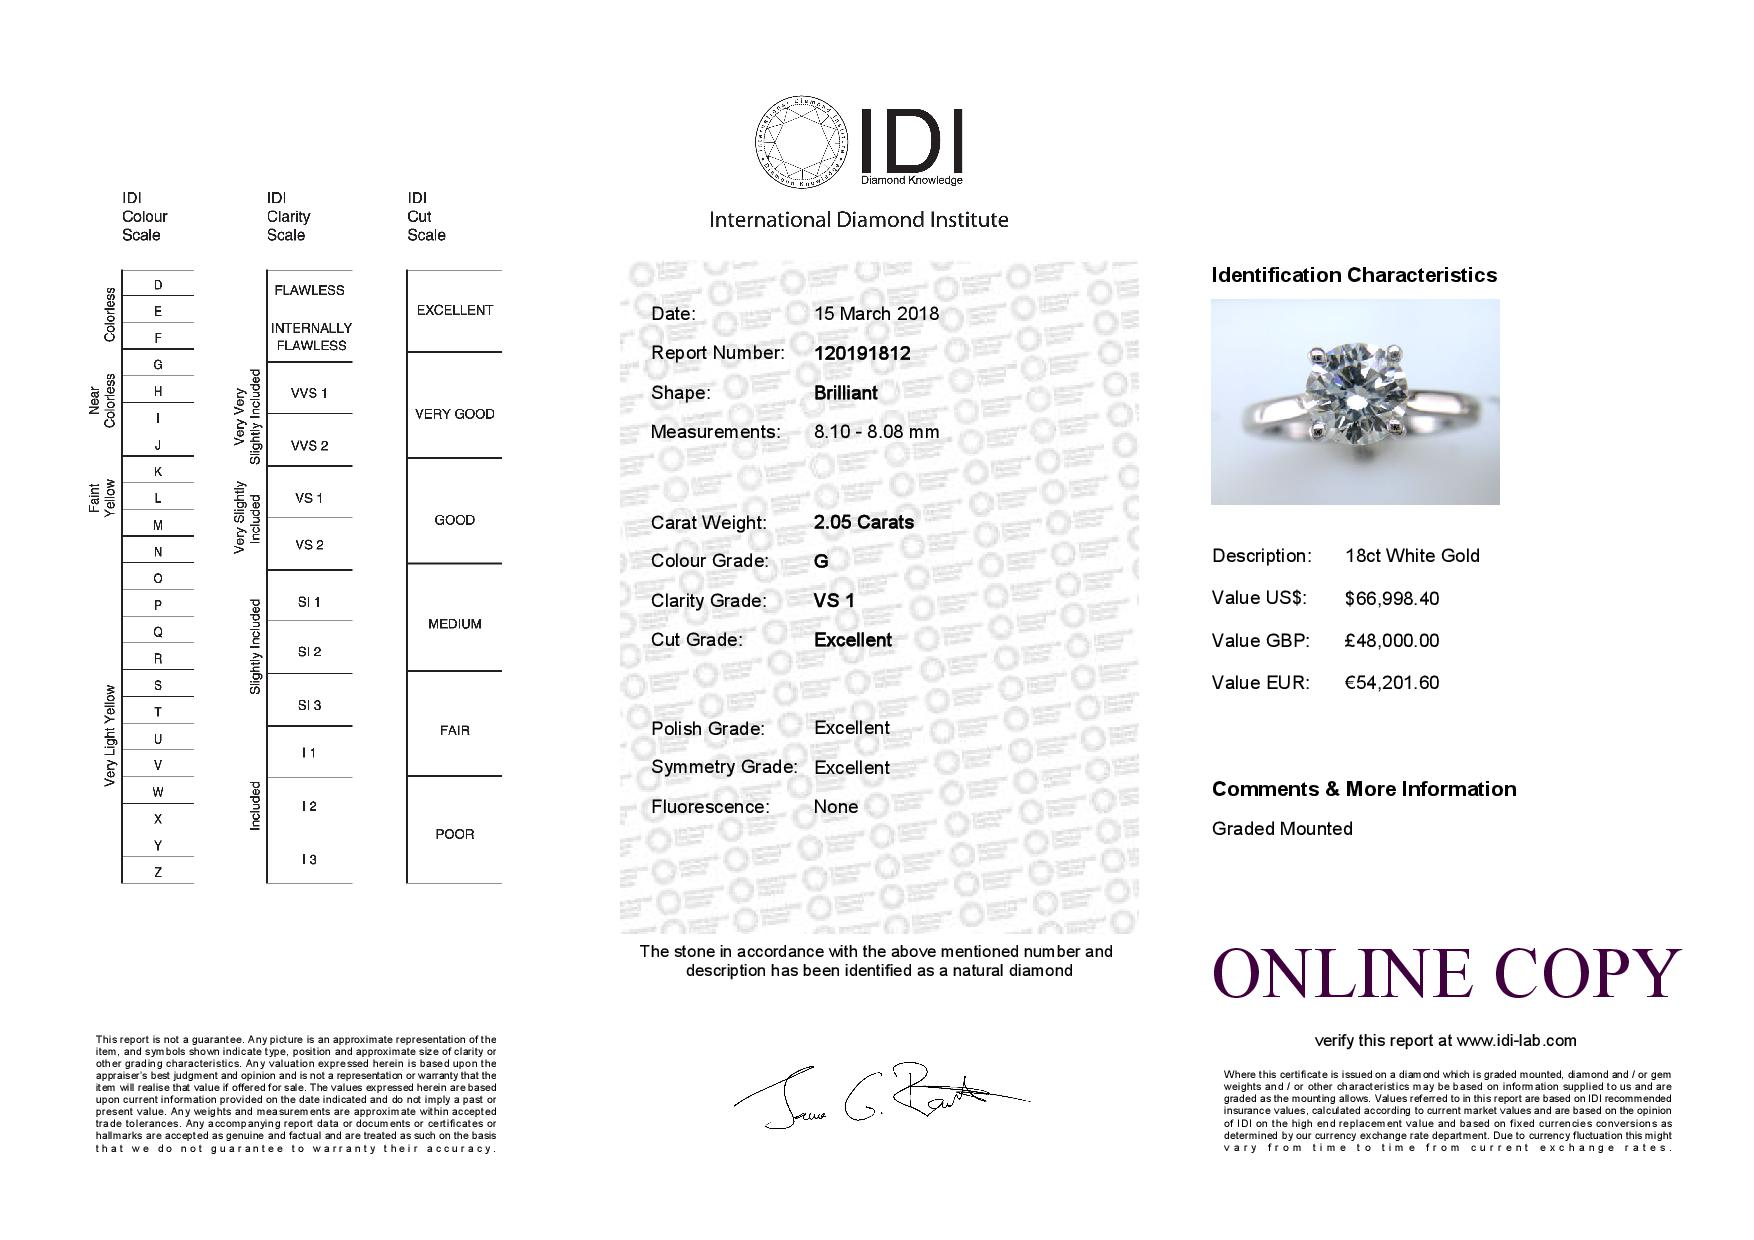 18ct White Gold Single Stone Claw Set Diamond Ring 2.05 Carats - Image 5 of 5